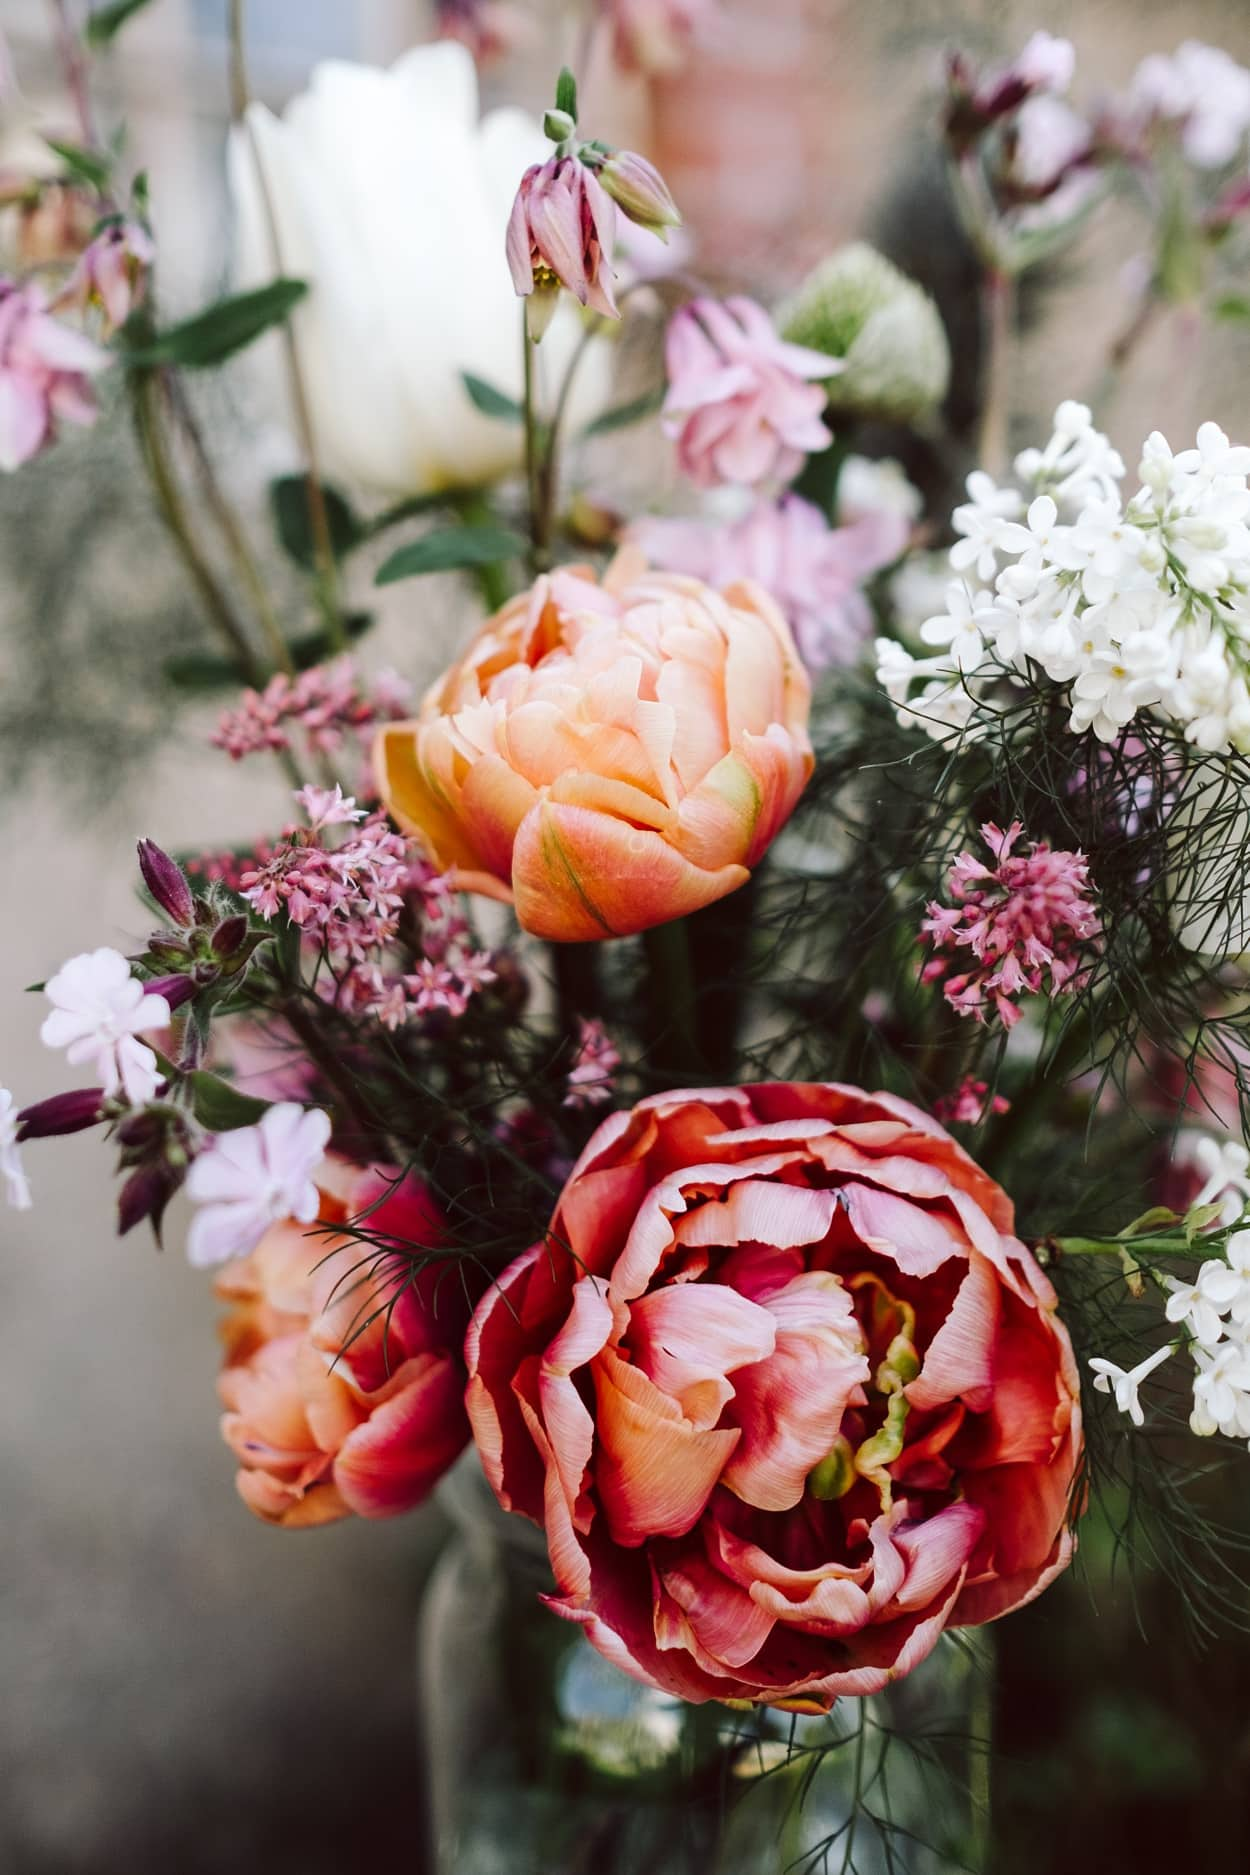 Kess InHouse Dawid ROC Bright Rose Abstract Green Floral Decorative Door 2 x 3 Floor Mat